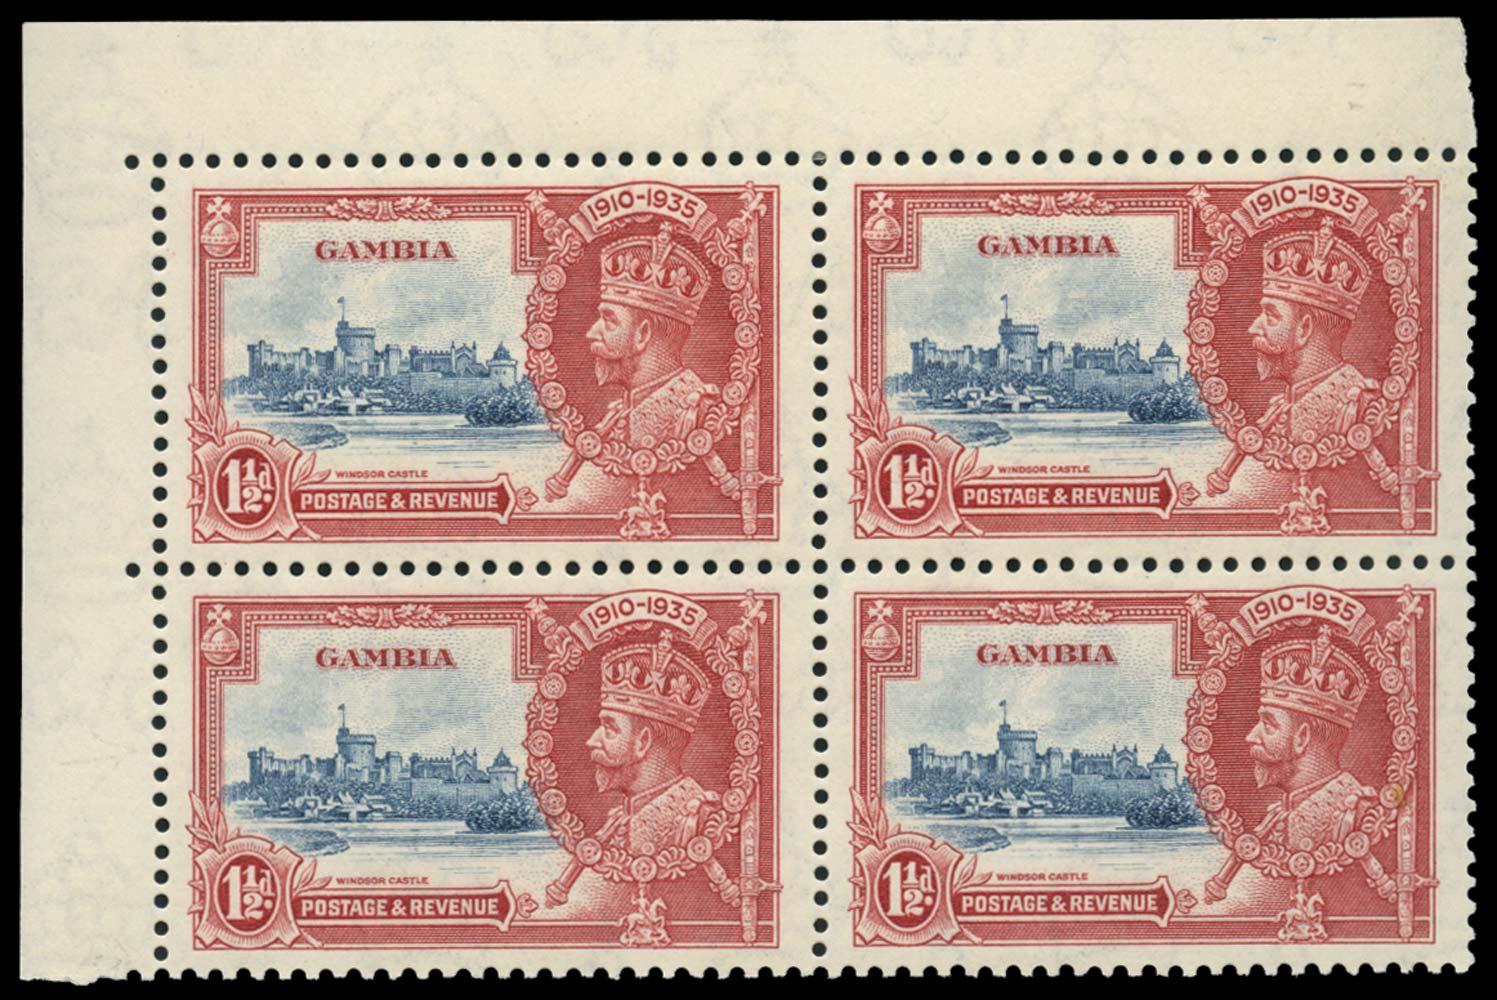 GAMBIA 1935  SG143/b Mint